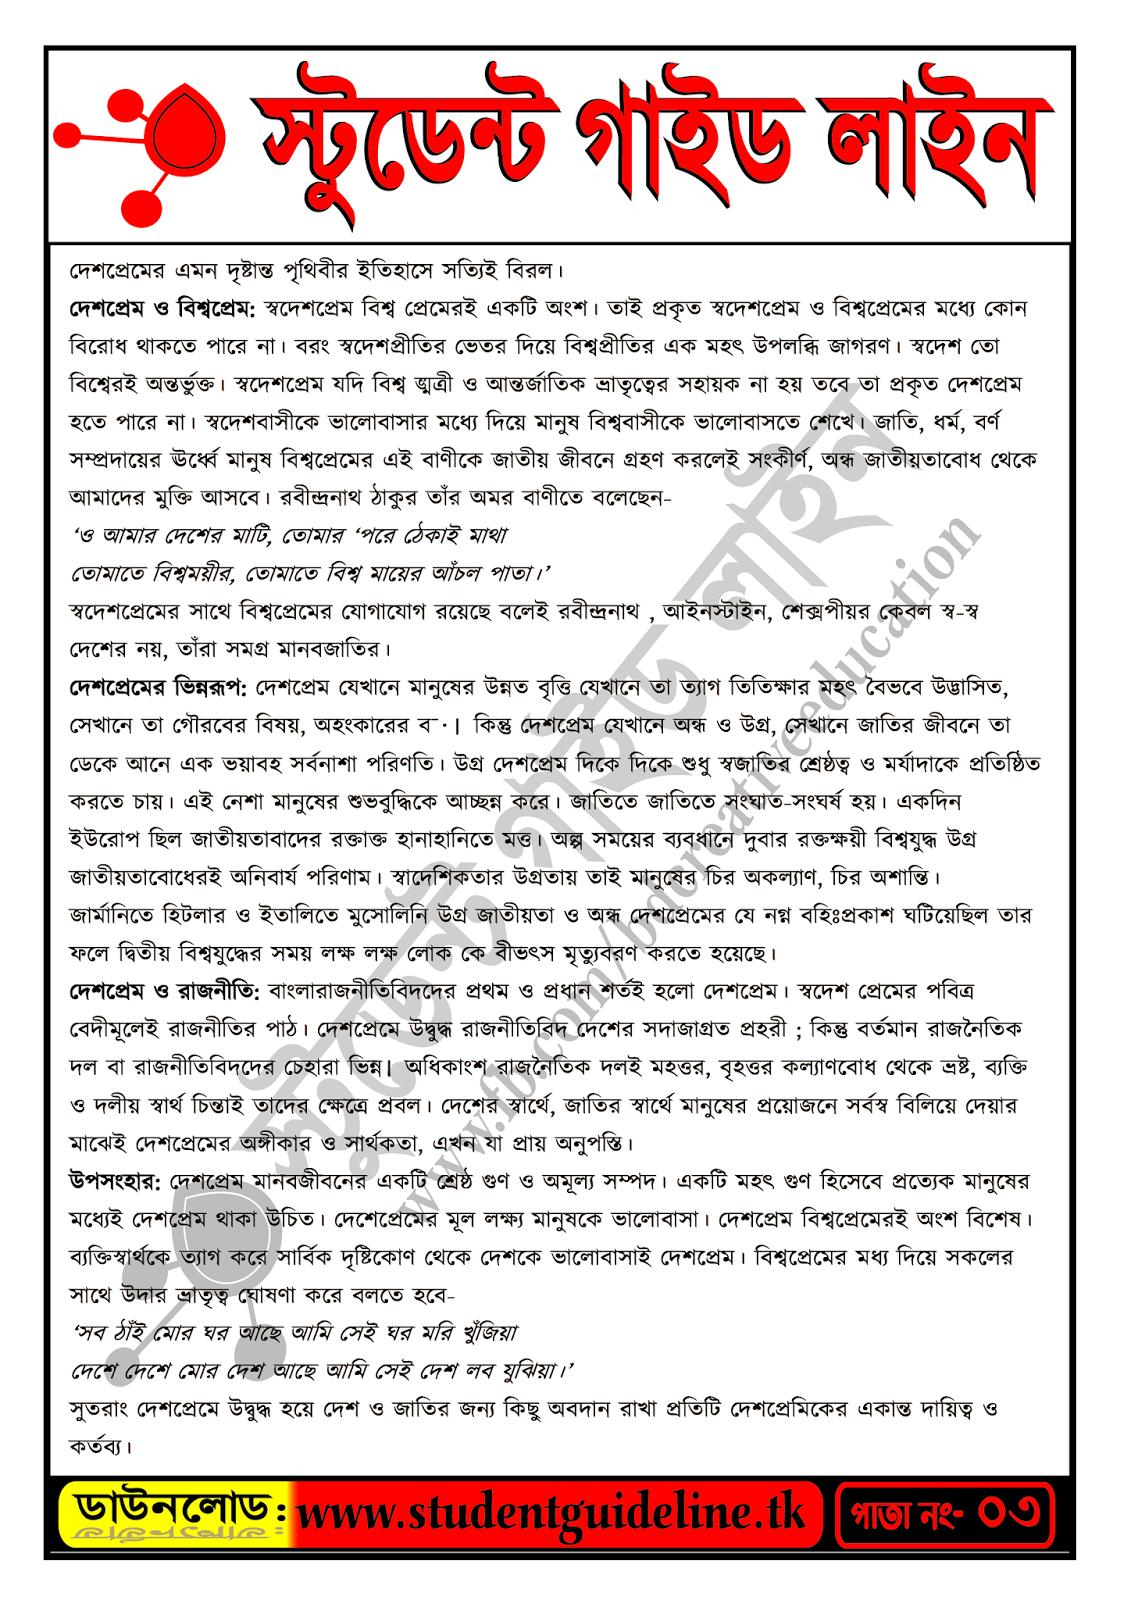 hsc ssc jsc bangla essay or composition patriotism 2474250924802476247225092471 2480245824722494